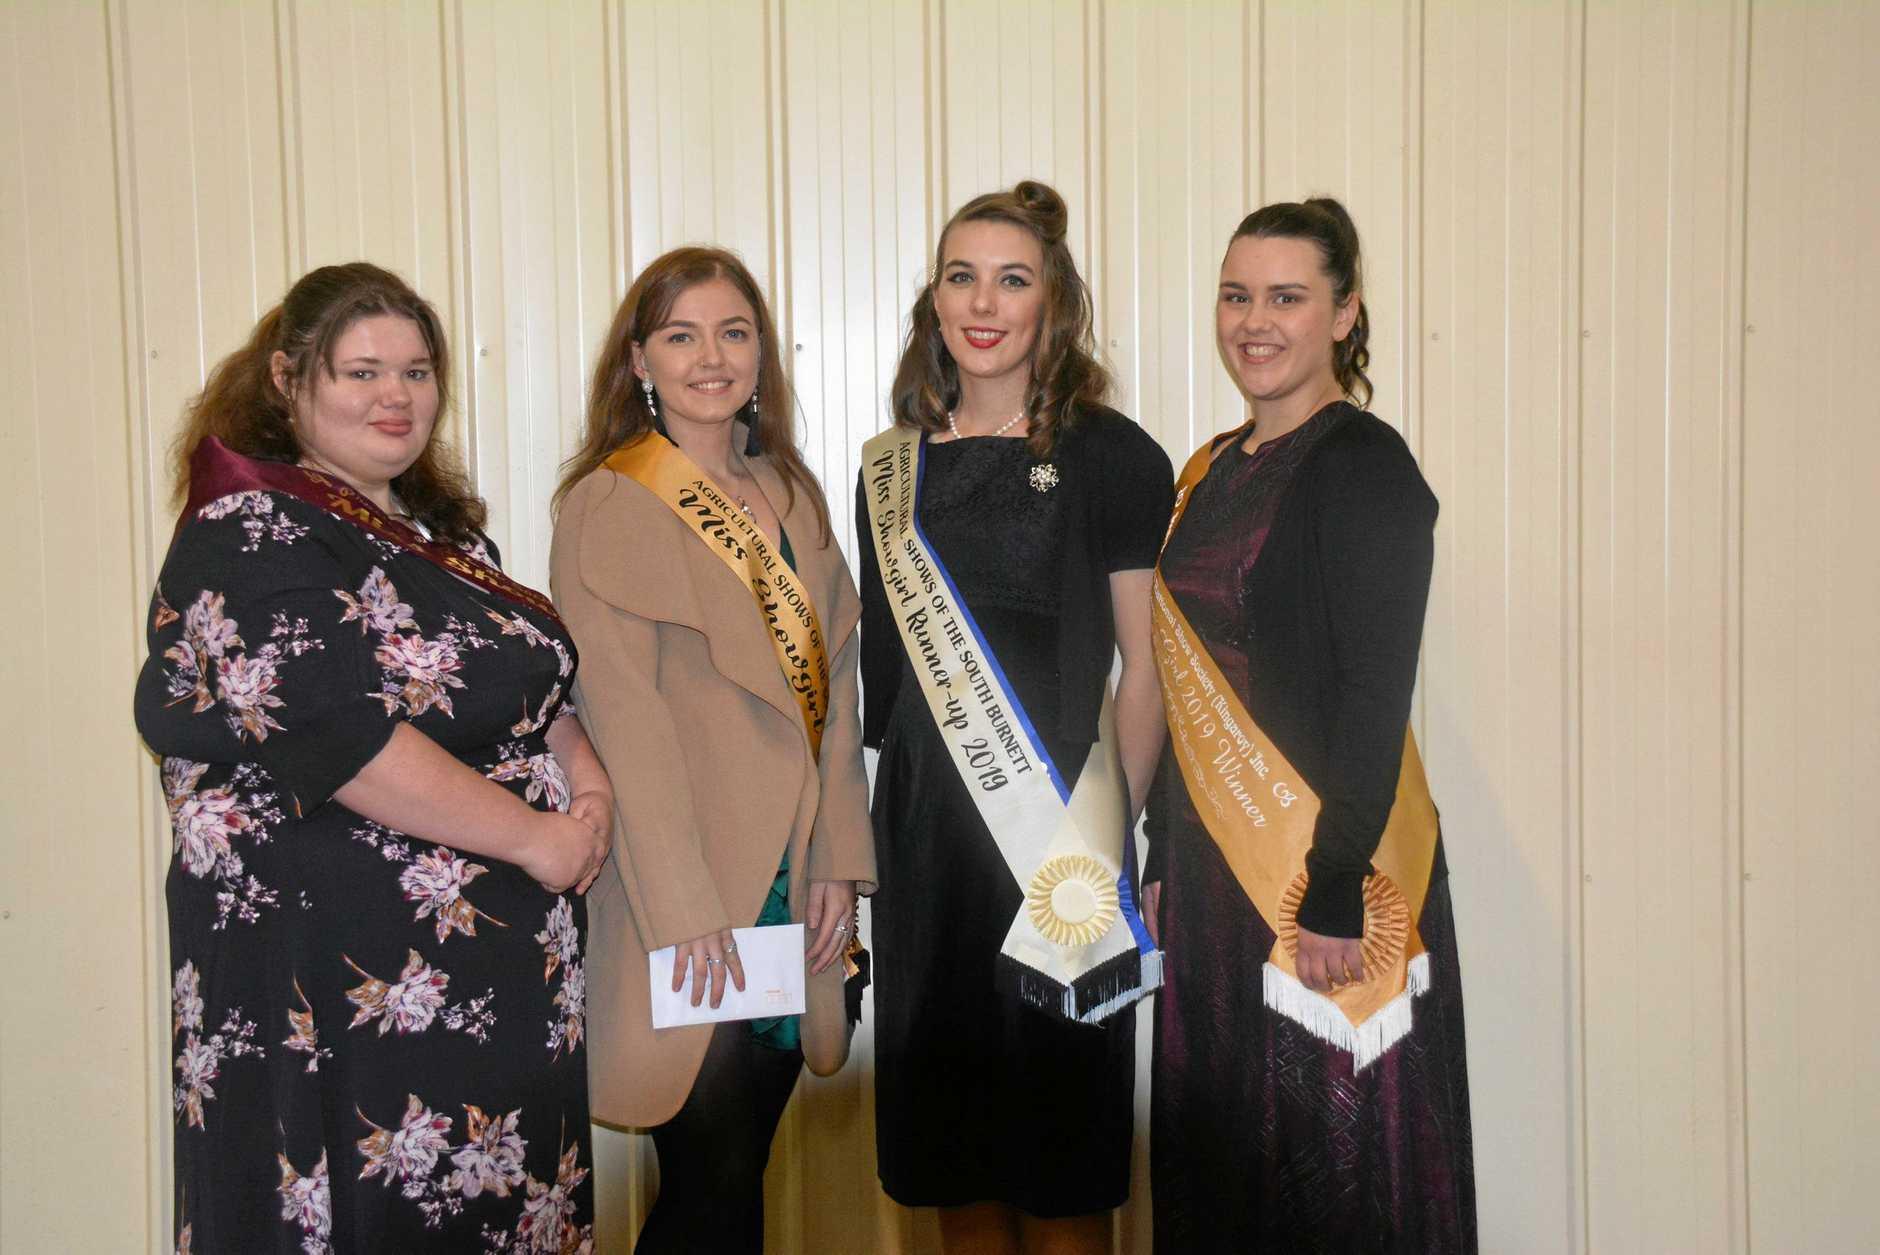 MISS SHOWGIRL; Hayley Flint (Proston), Winner Teagan Hall (Murgon), Runner Up Claire-Marie Pepper (Nanango), and Jessica McGrath (Kingaroy).